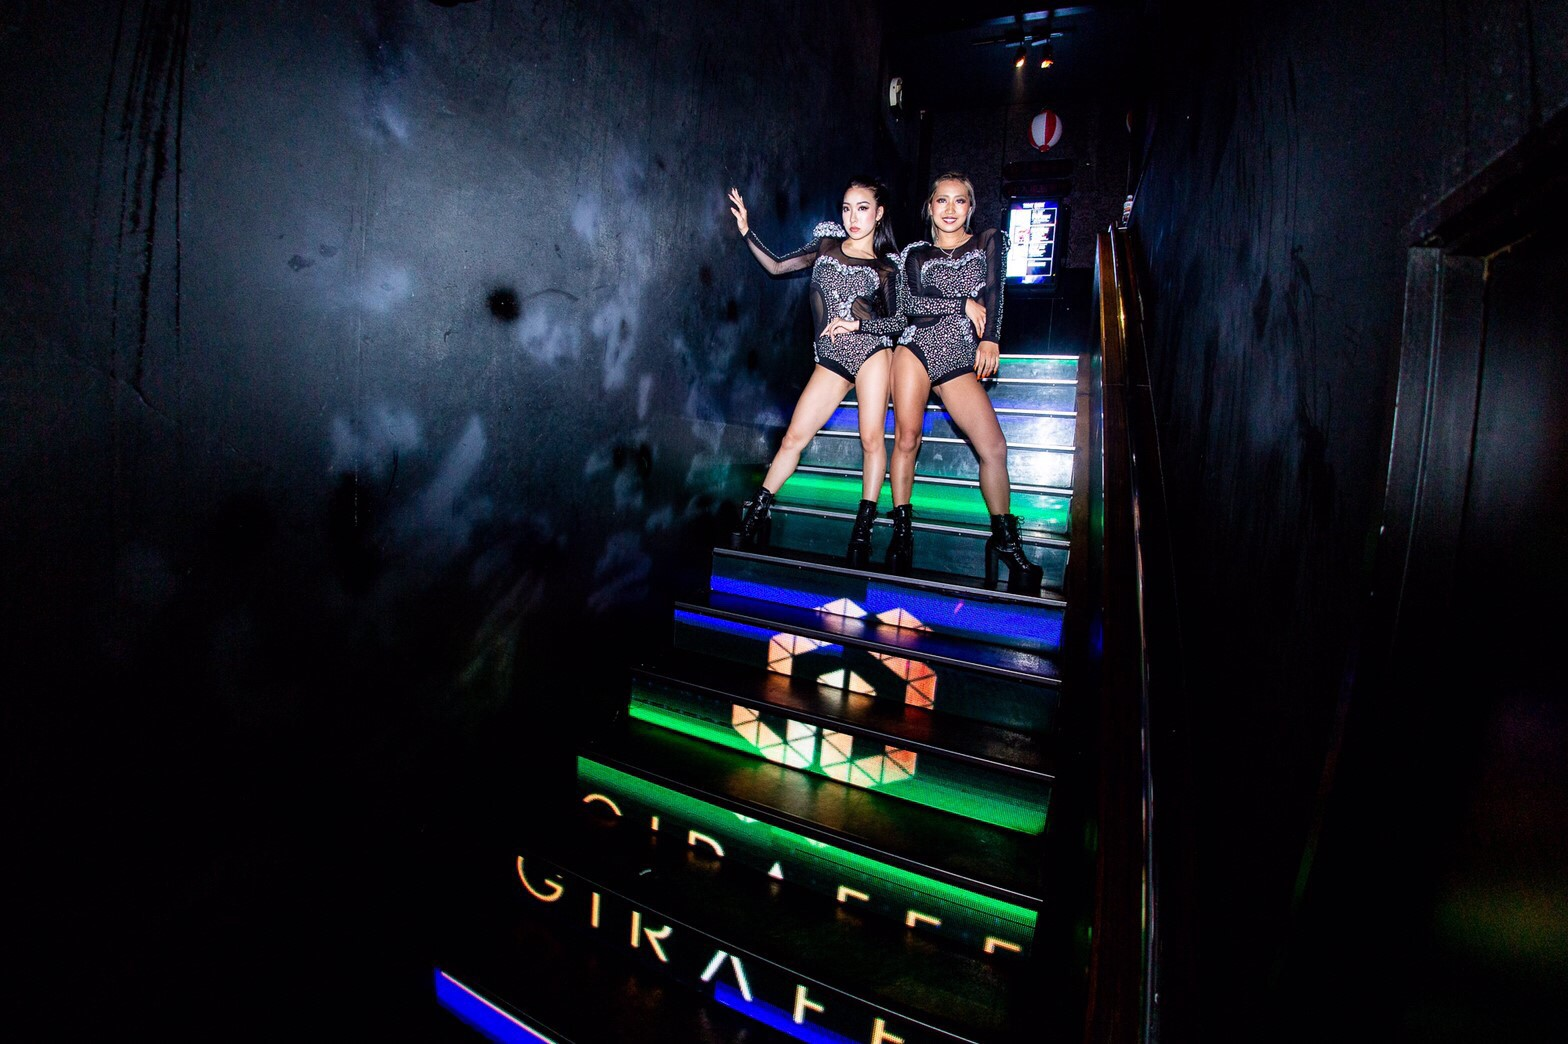 Giraffe Japan: Osaka's Most Famous Nightclub in the Heart of downtown Dotonbori